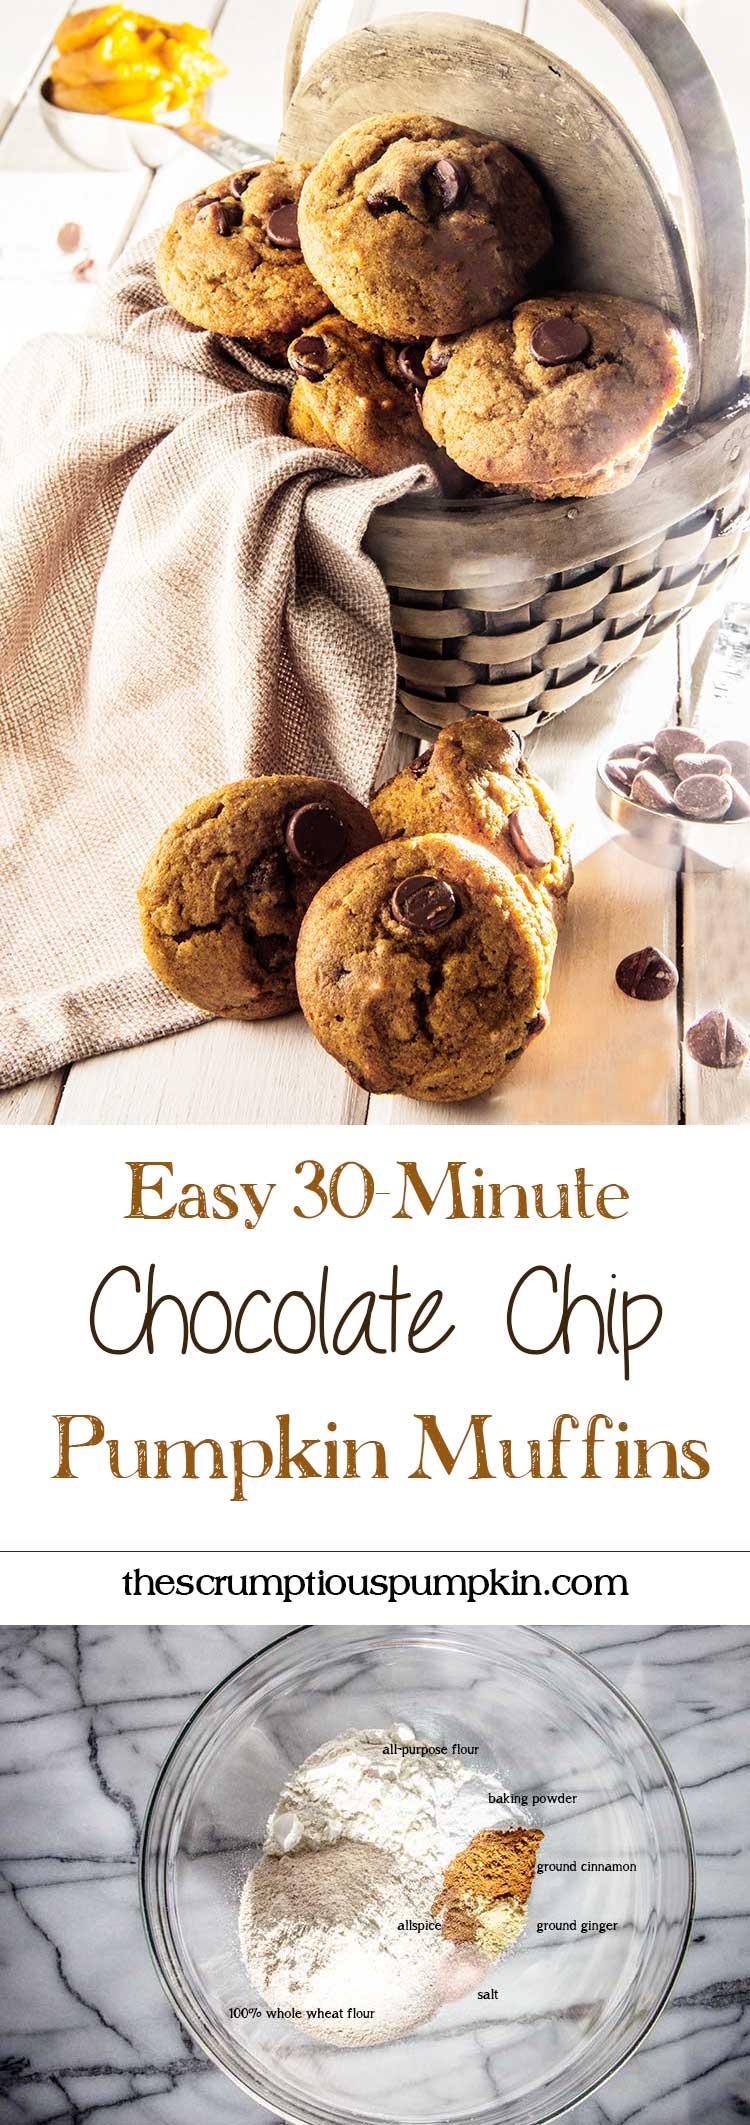 easy-30-minute-chocolate-chip-pumpkin-muffins